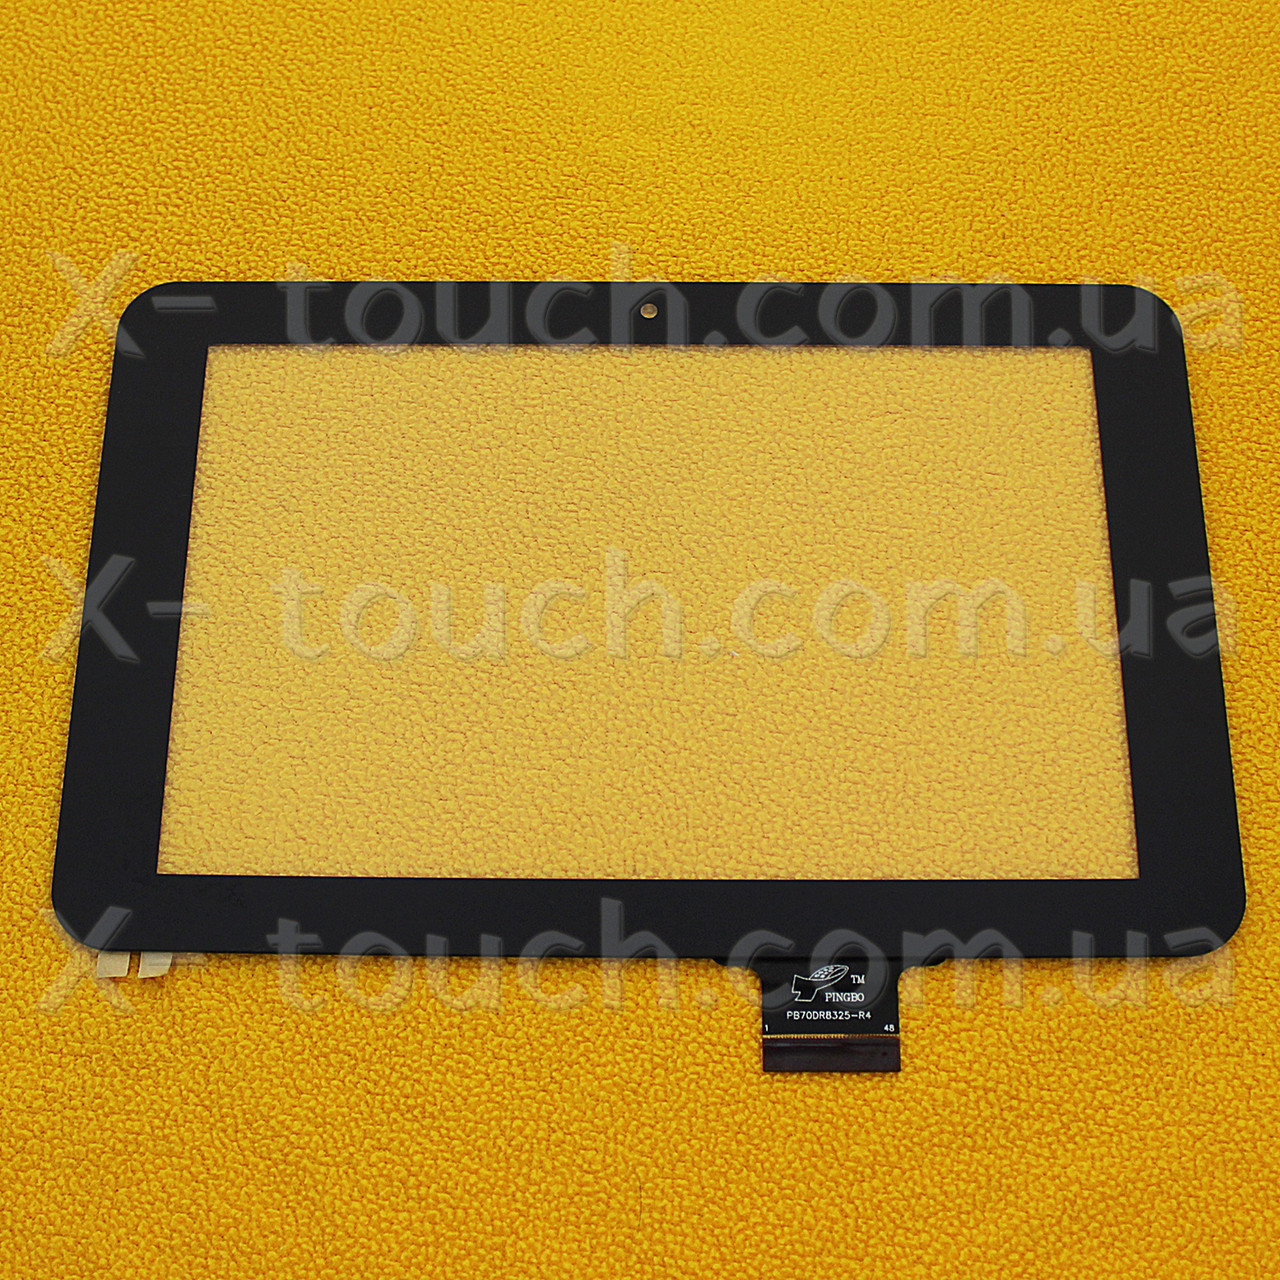 Тачскрин, сенсор  Pingbo PB70DR8325-R4 (48PIN) для планшета